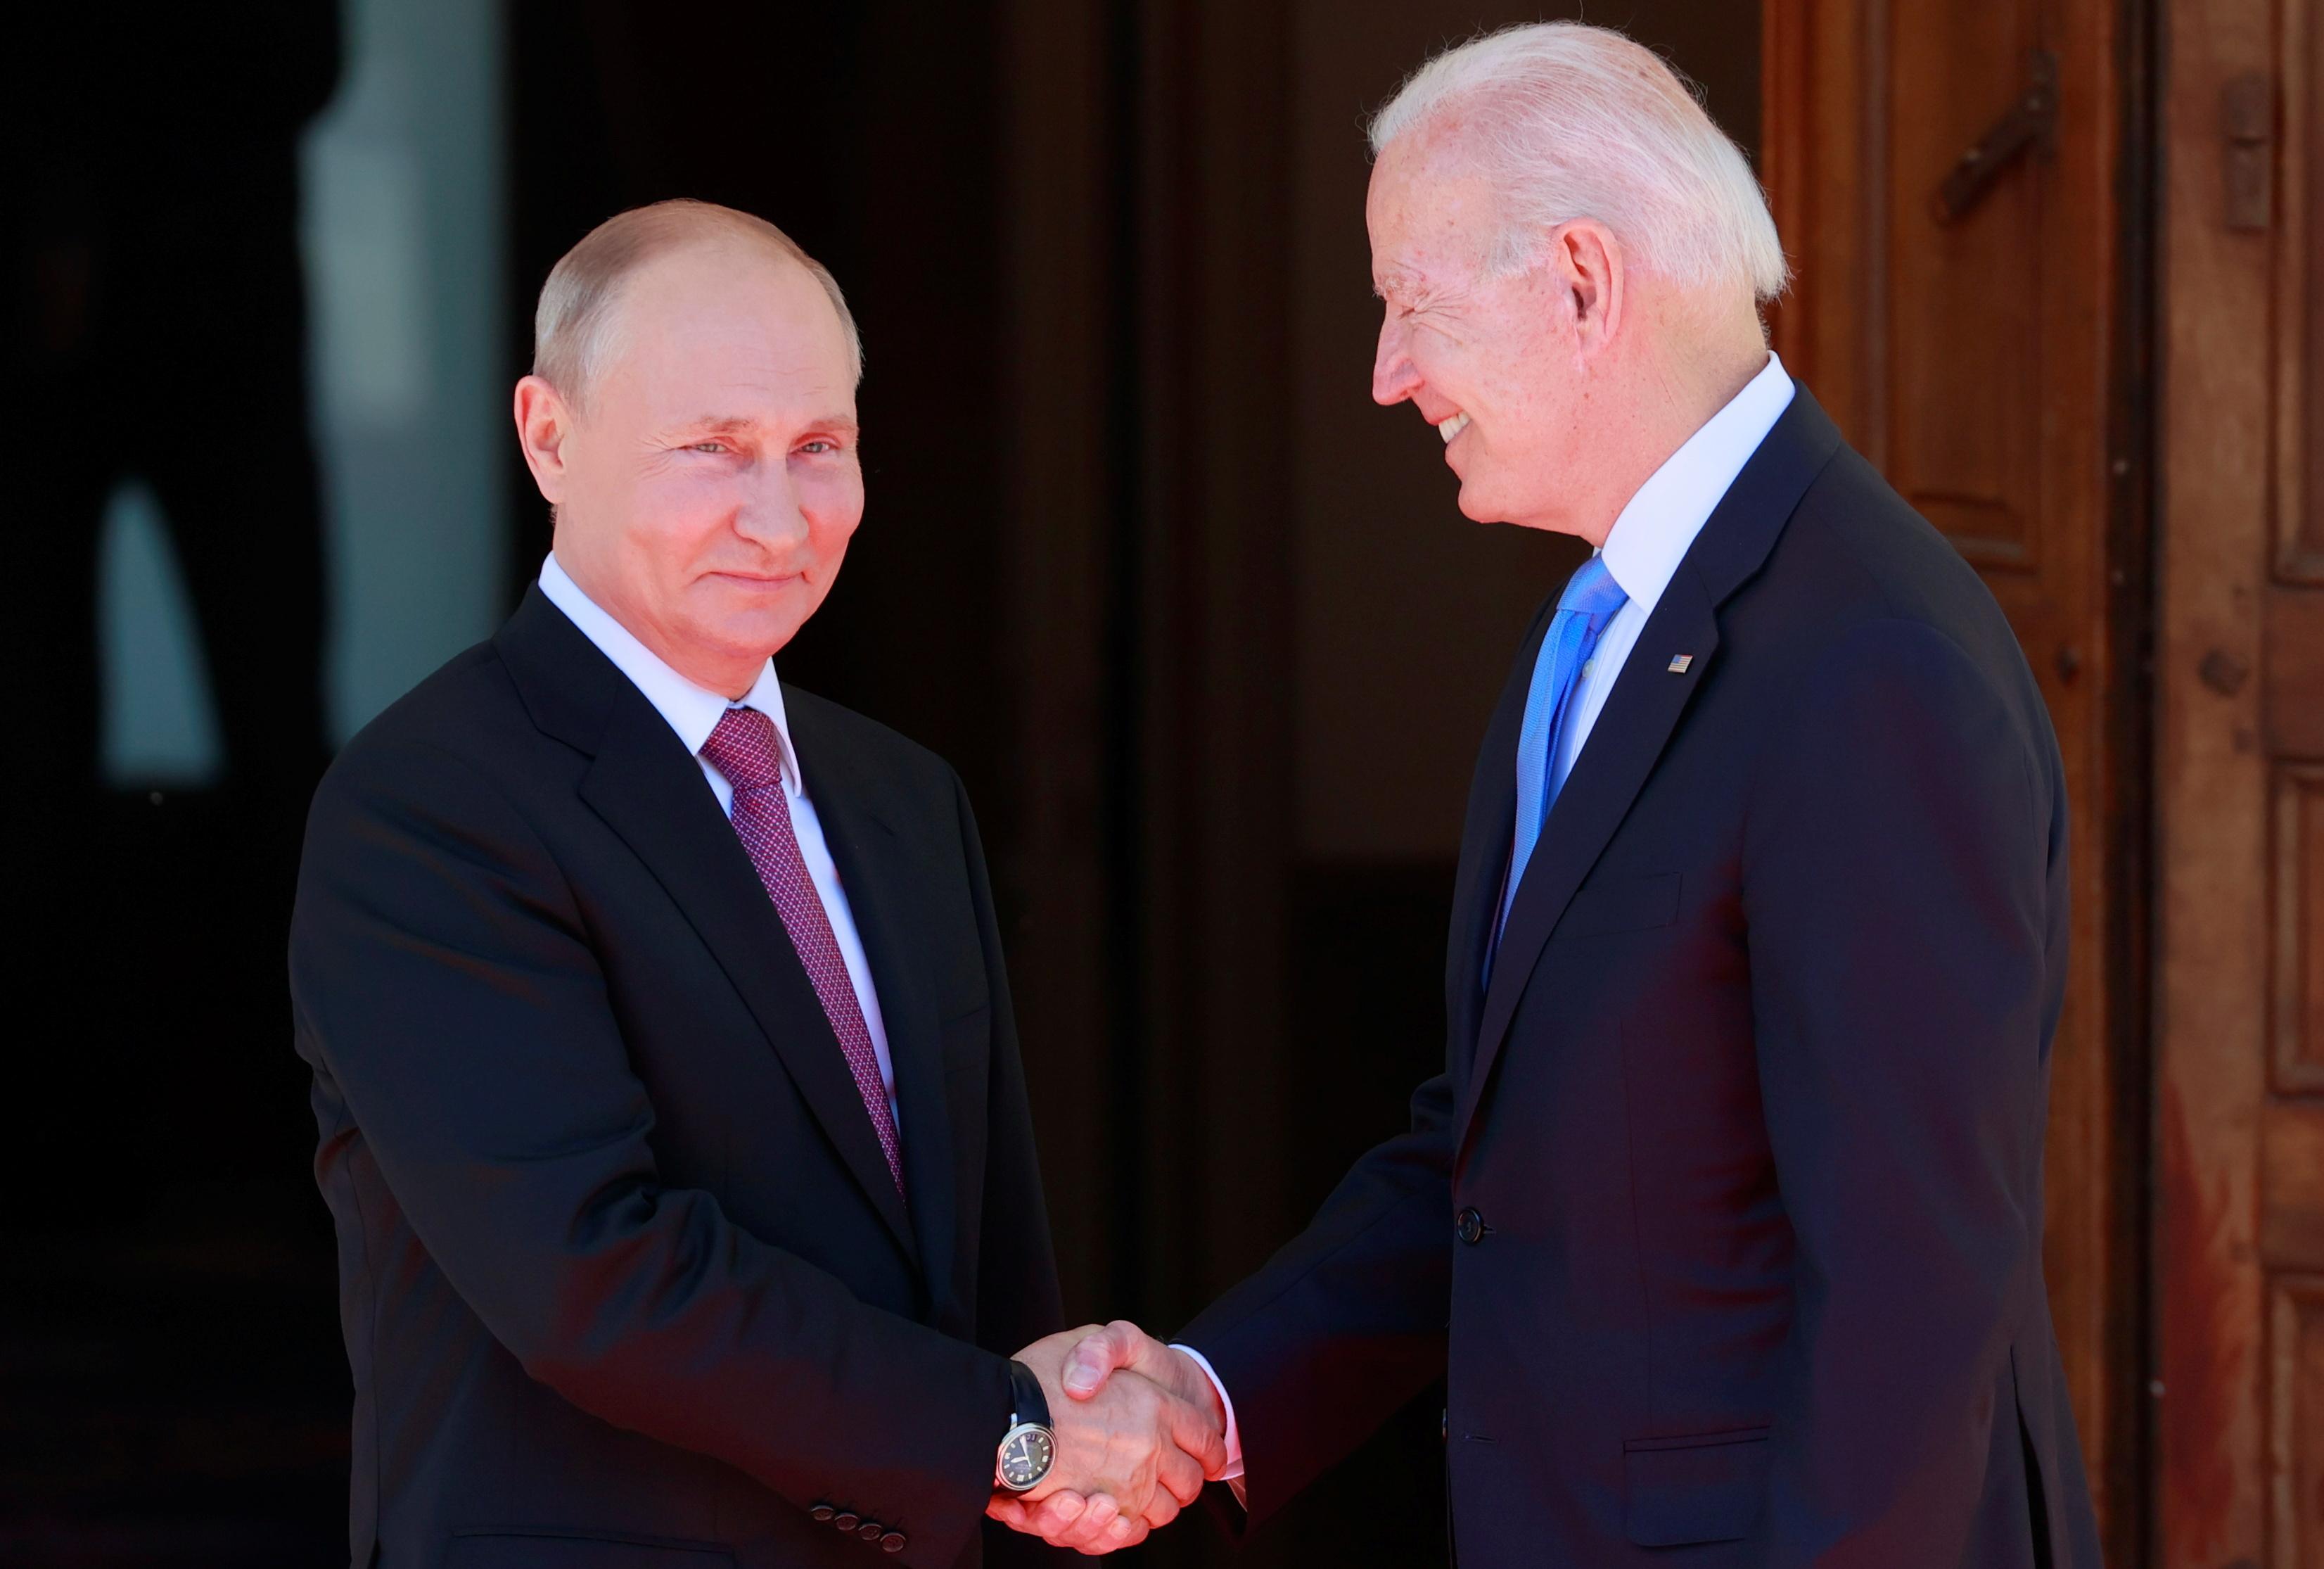 U.S. President Joe Biden and Russia's President Vladimir Putin shake hands during the U.S.-Russia summit at Villa La Grange in Geneva, Switzerland, June 16, 2021. REUTERS/Denis Balibouse/Pool